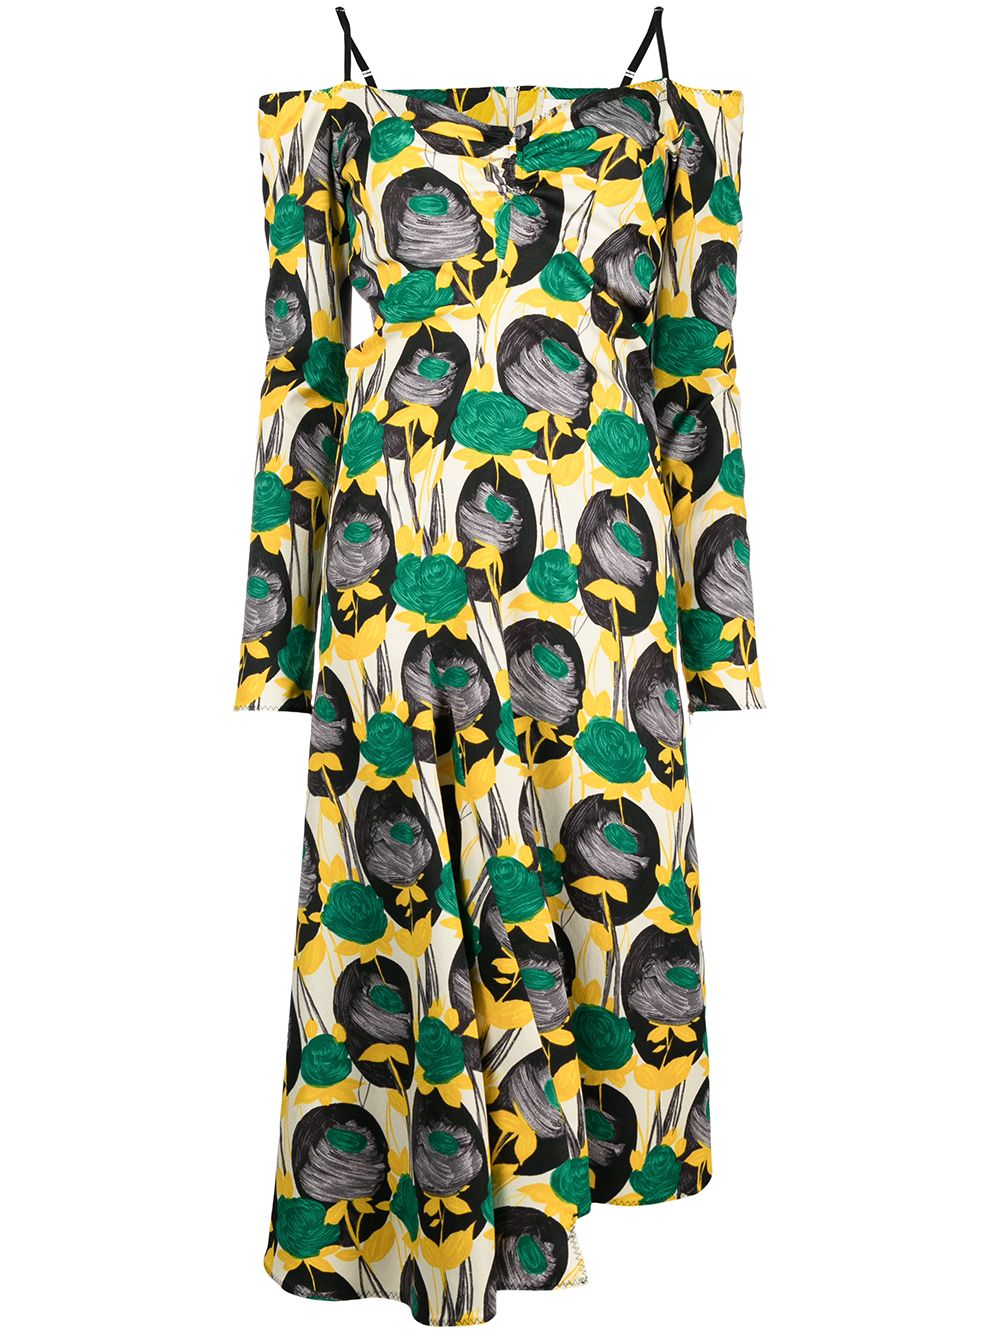 SPORTMAX | Dress | COLOMBA001